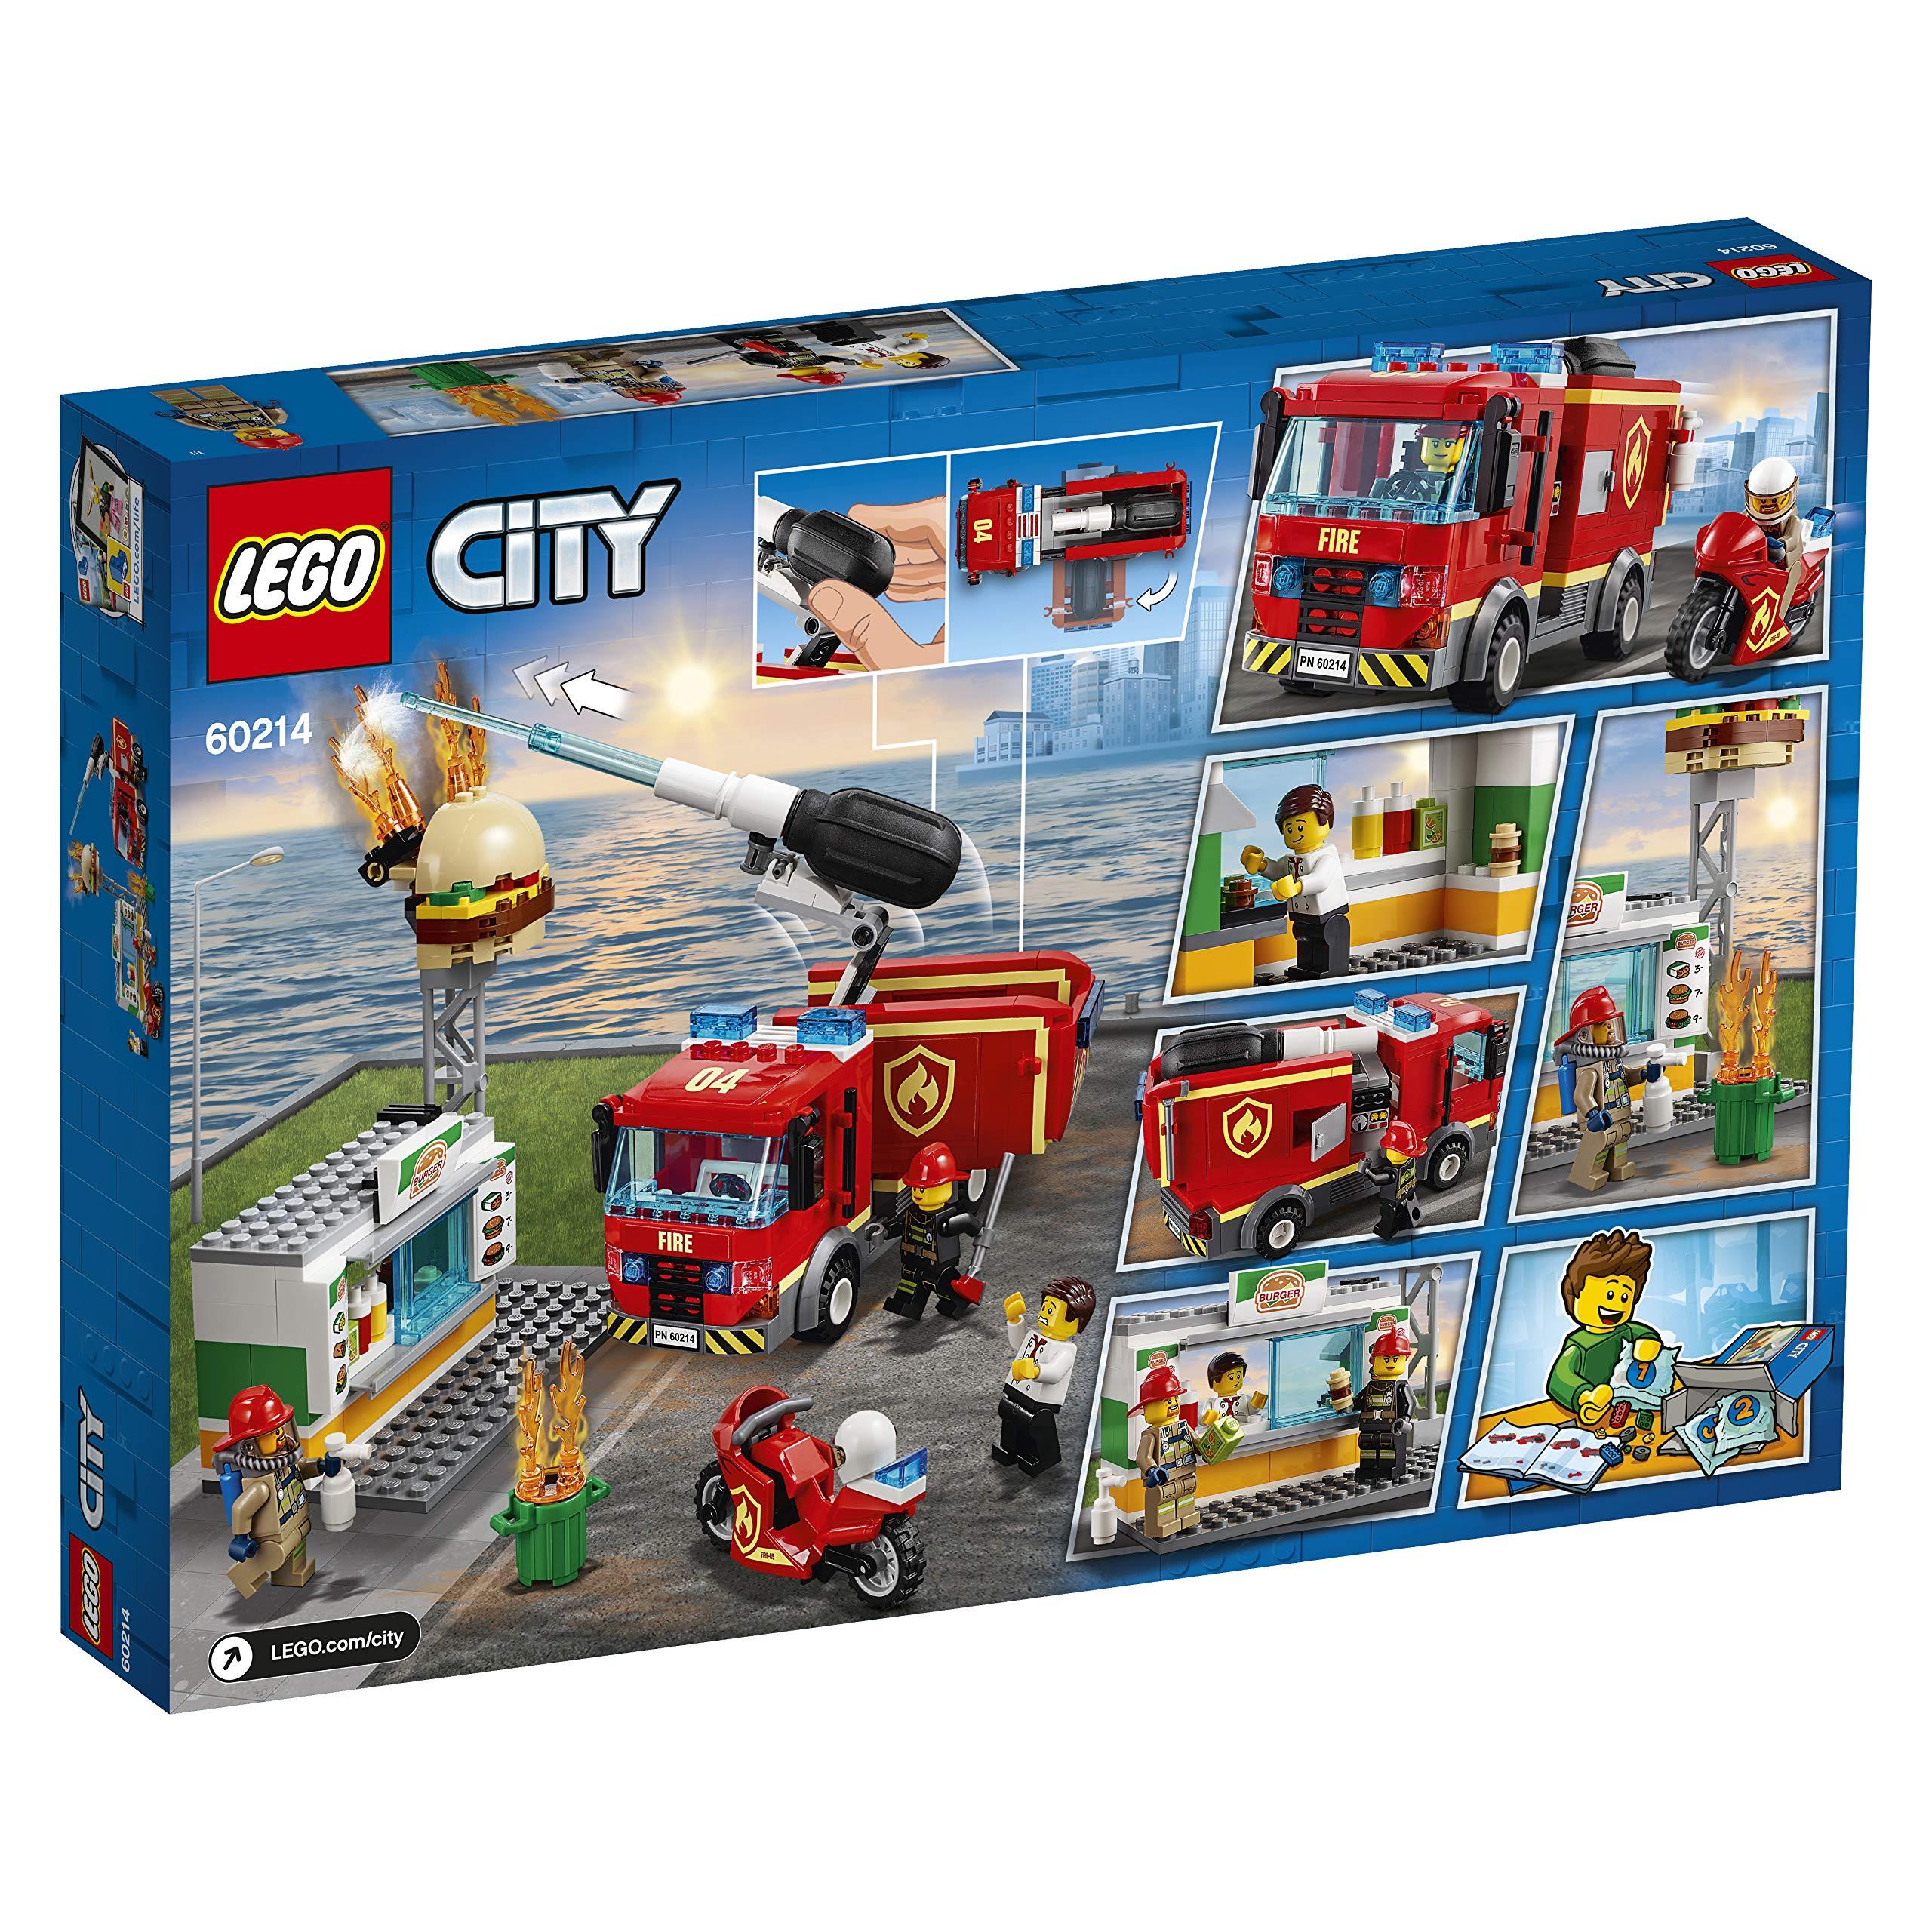 LEGO New Item Fireman/'s Ax Tool Minifigure Accessory